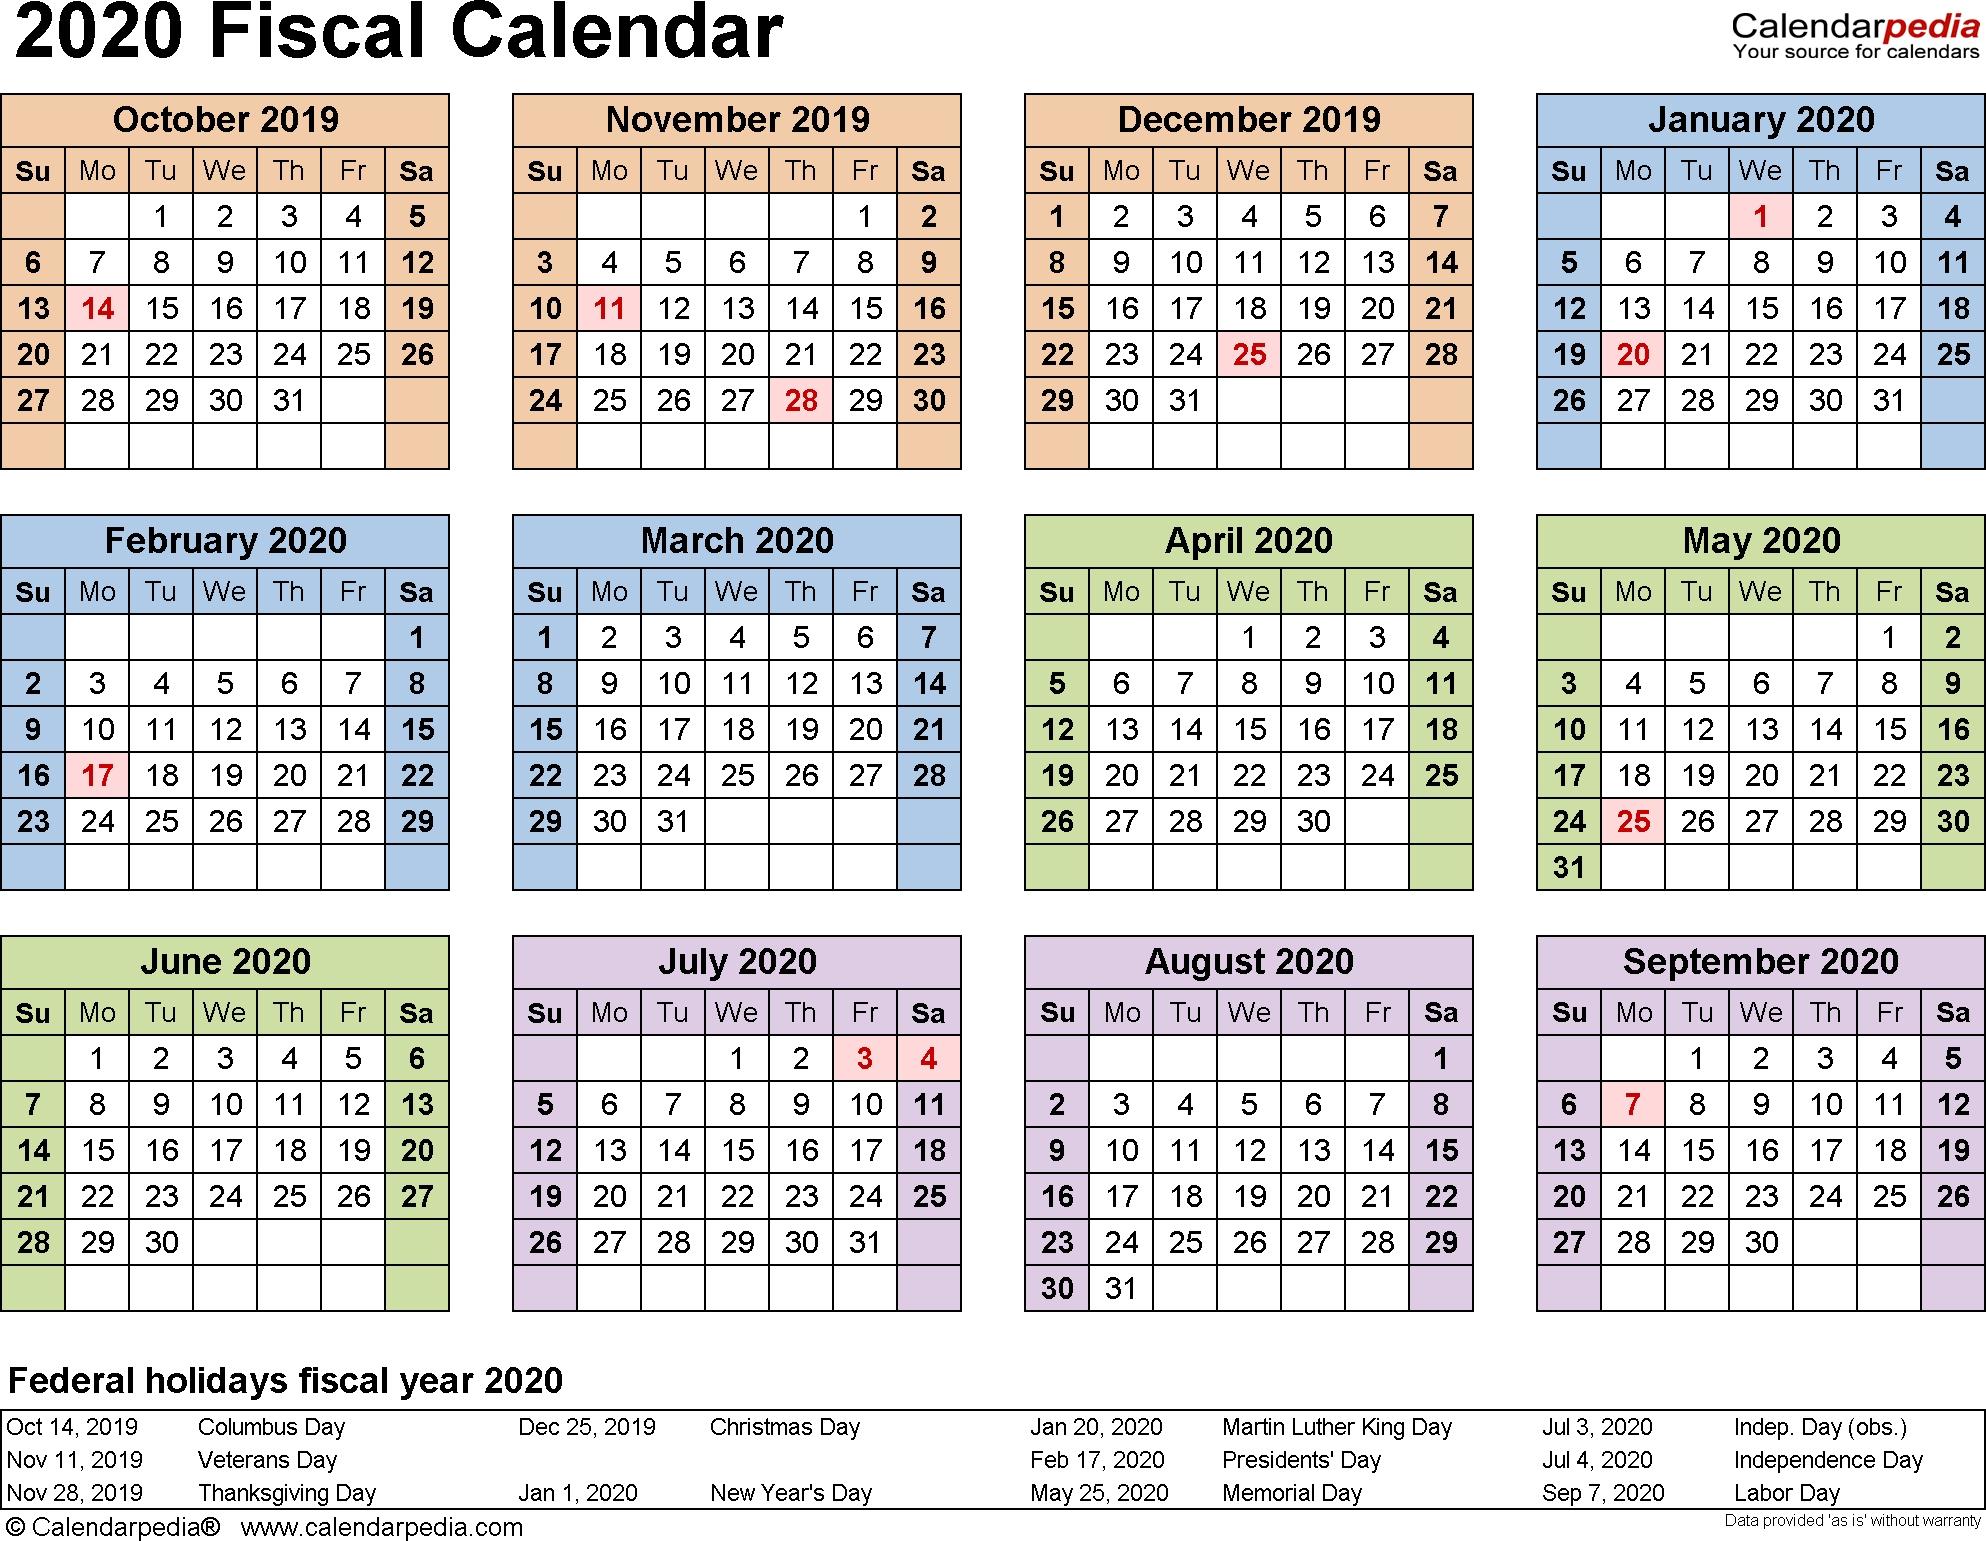 Retail Calander 2020 - Calendar Inspiration Design throughout Hmrc Tax 2019 - 2020 Calendars